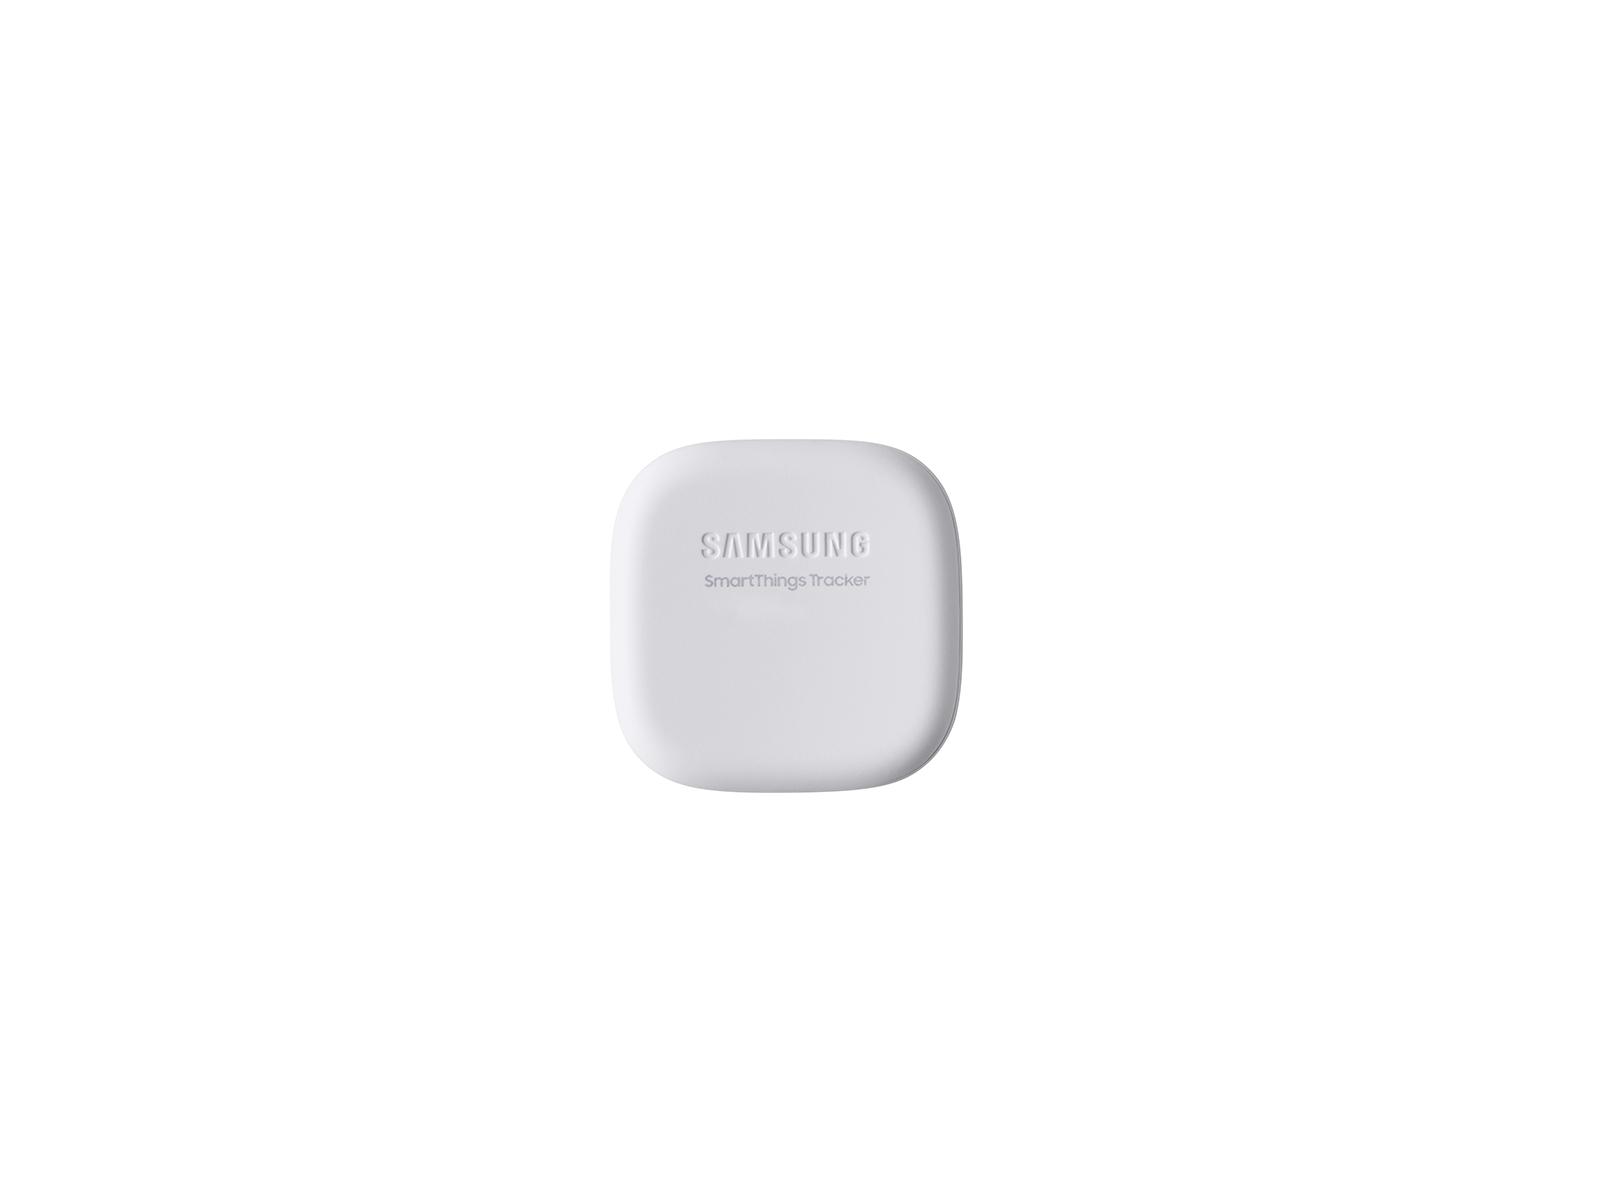 SmartThings Tracker SmartThings Tracker - SM-V110AZWAATT | Samsung US